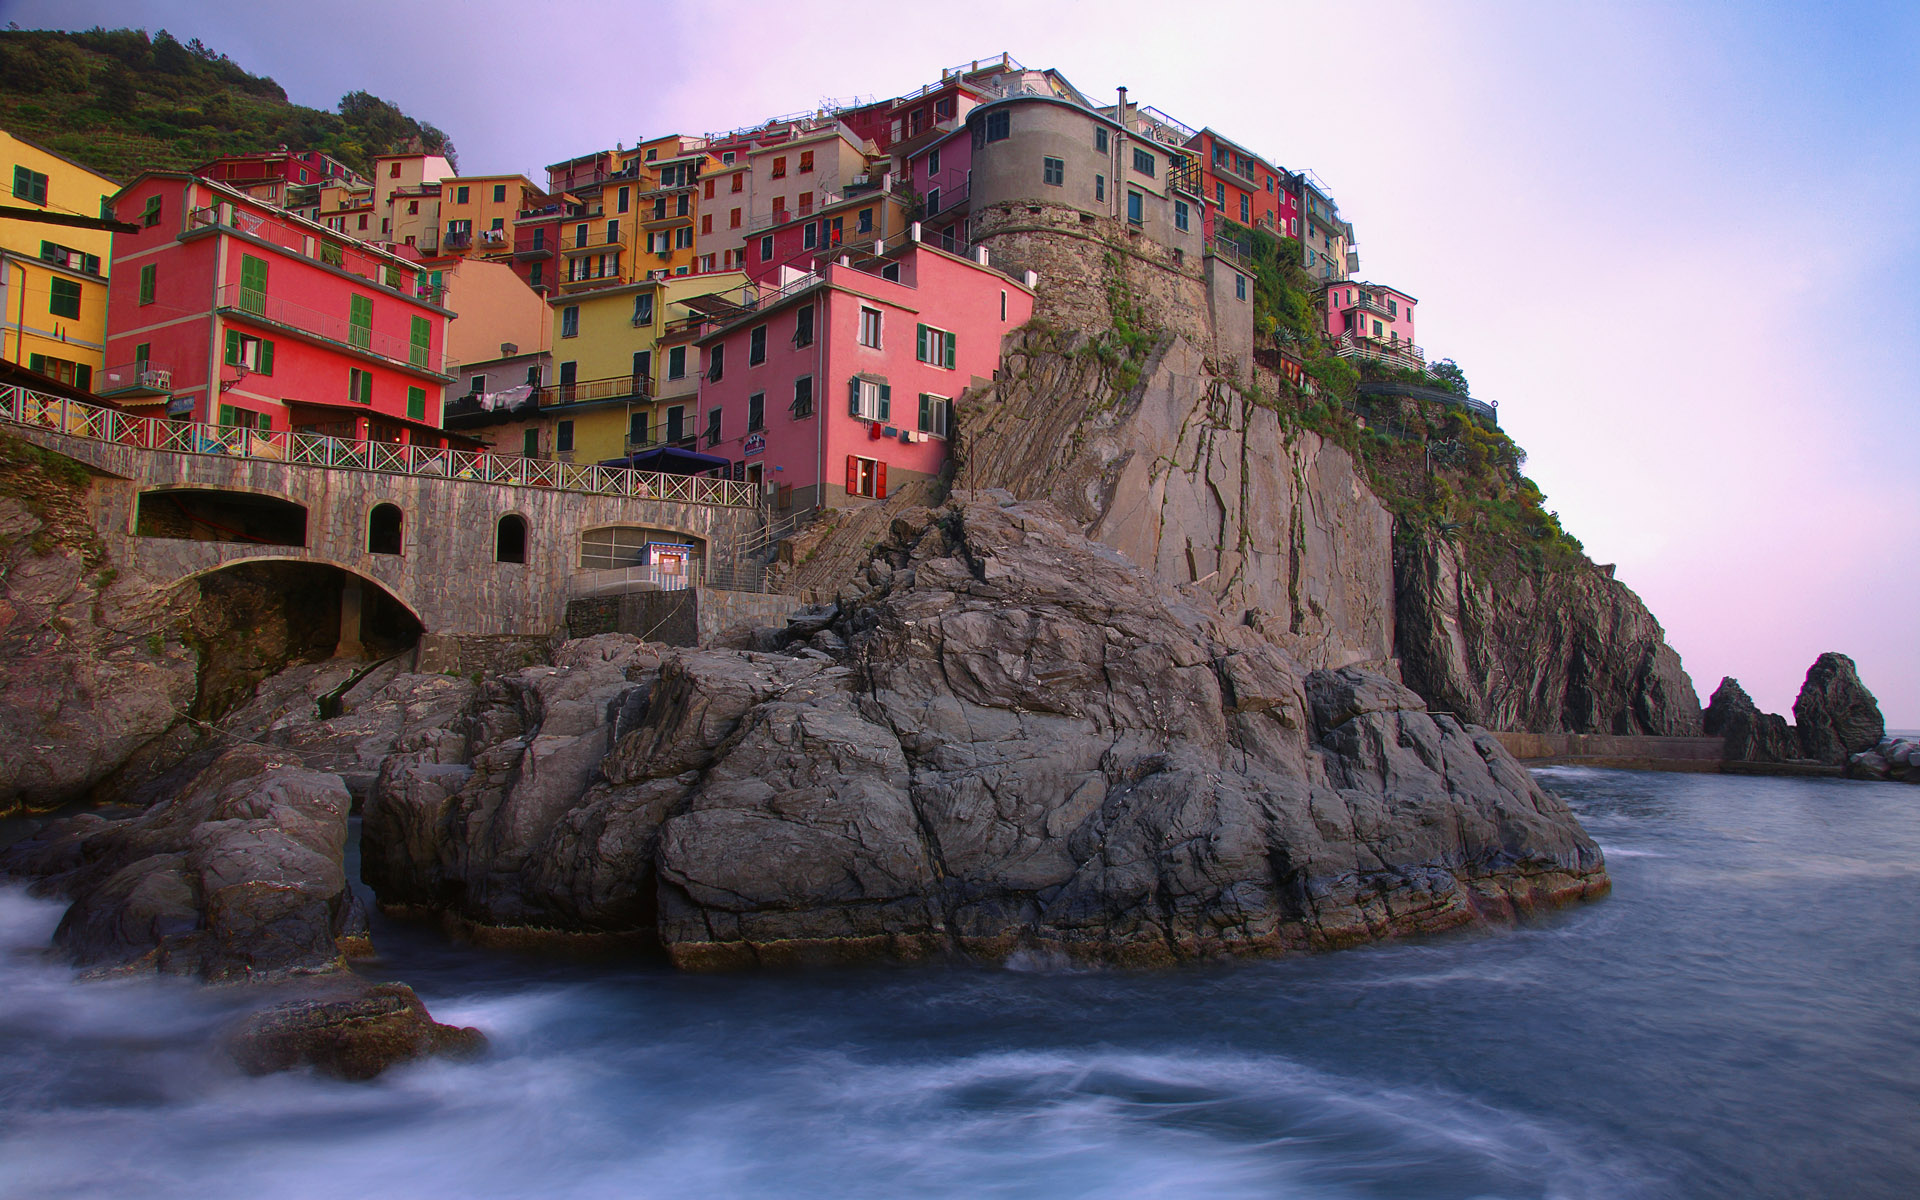 Italy Desktop Wallpapers FREE on Latorocom 1920x1200